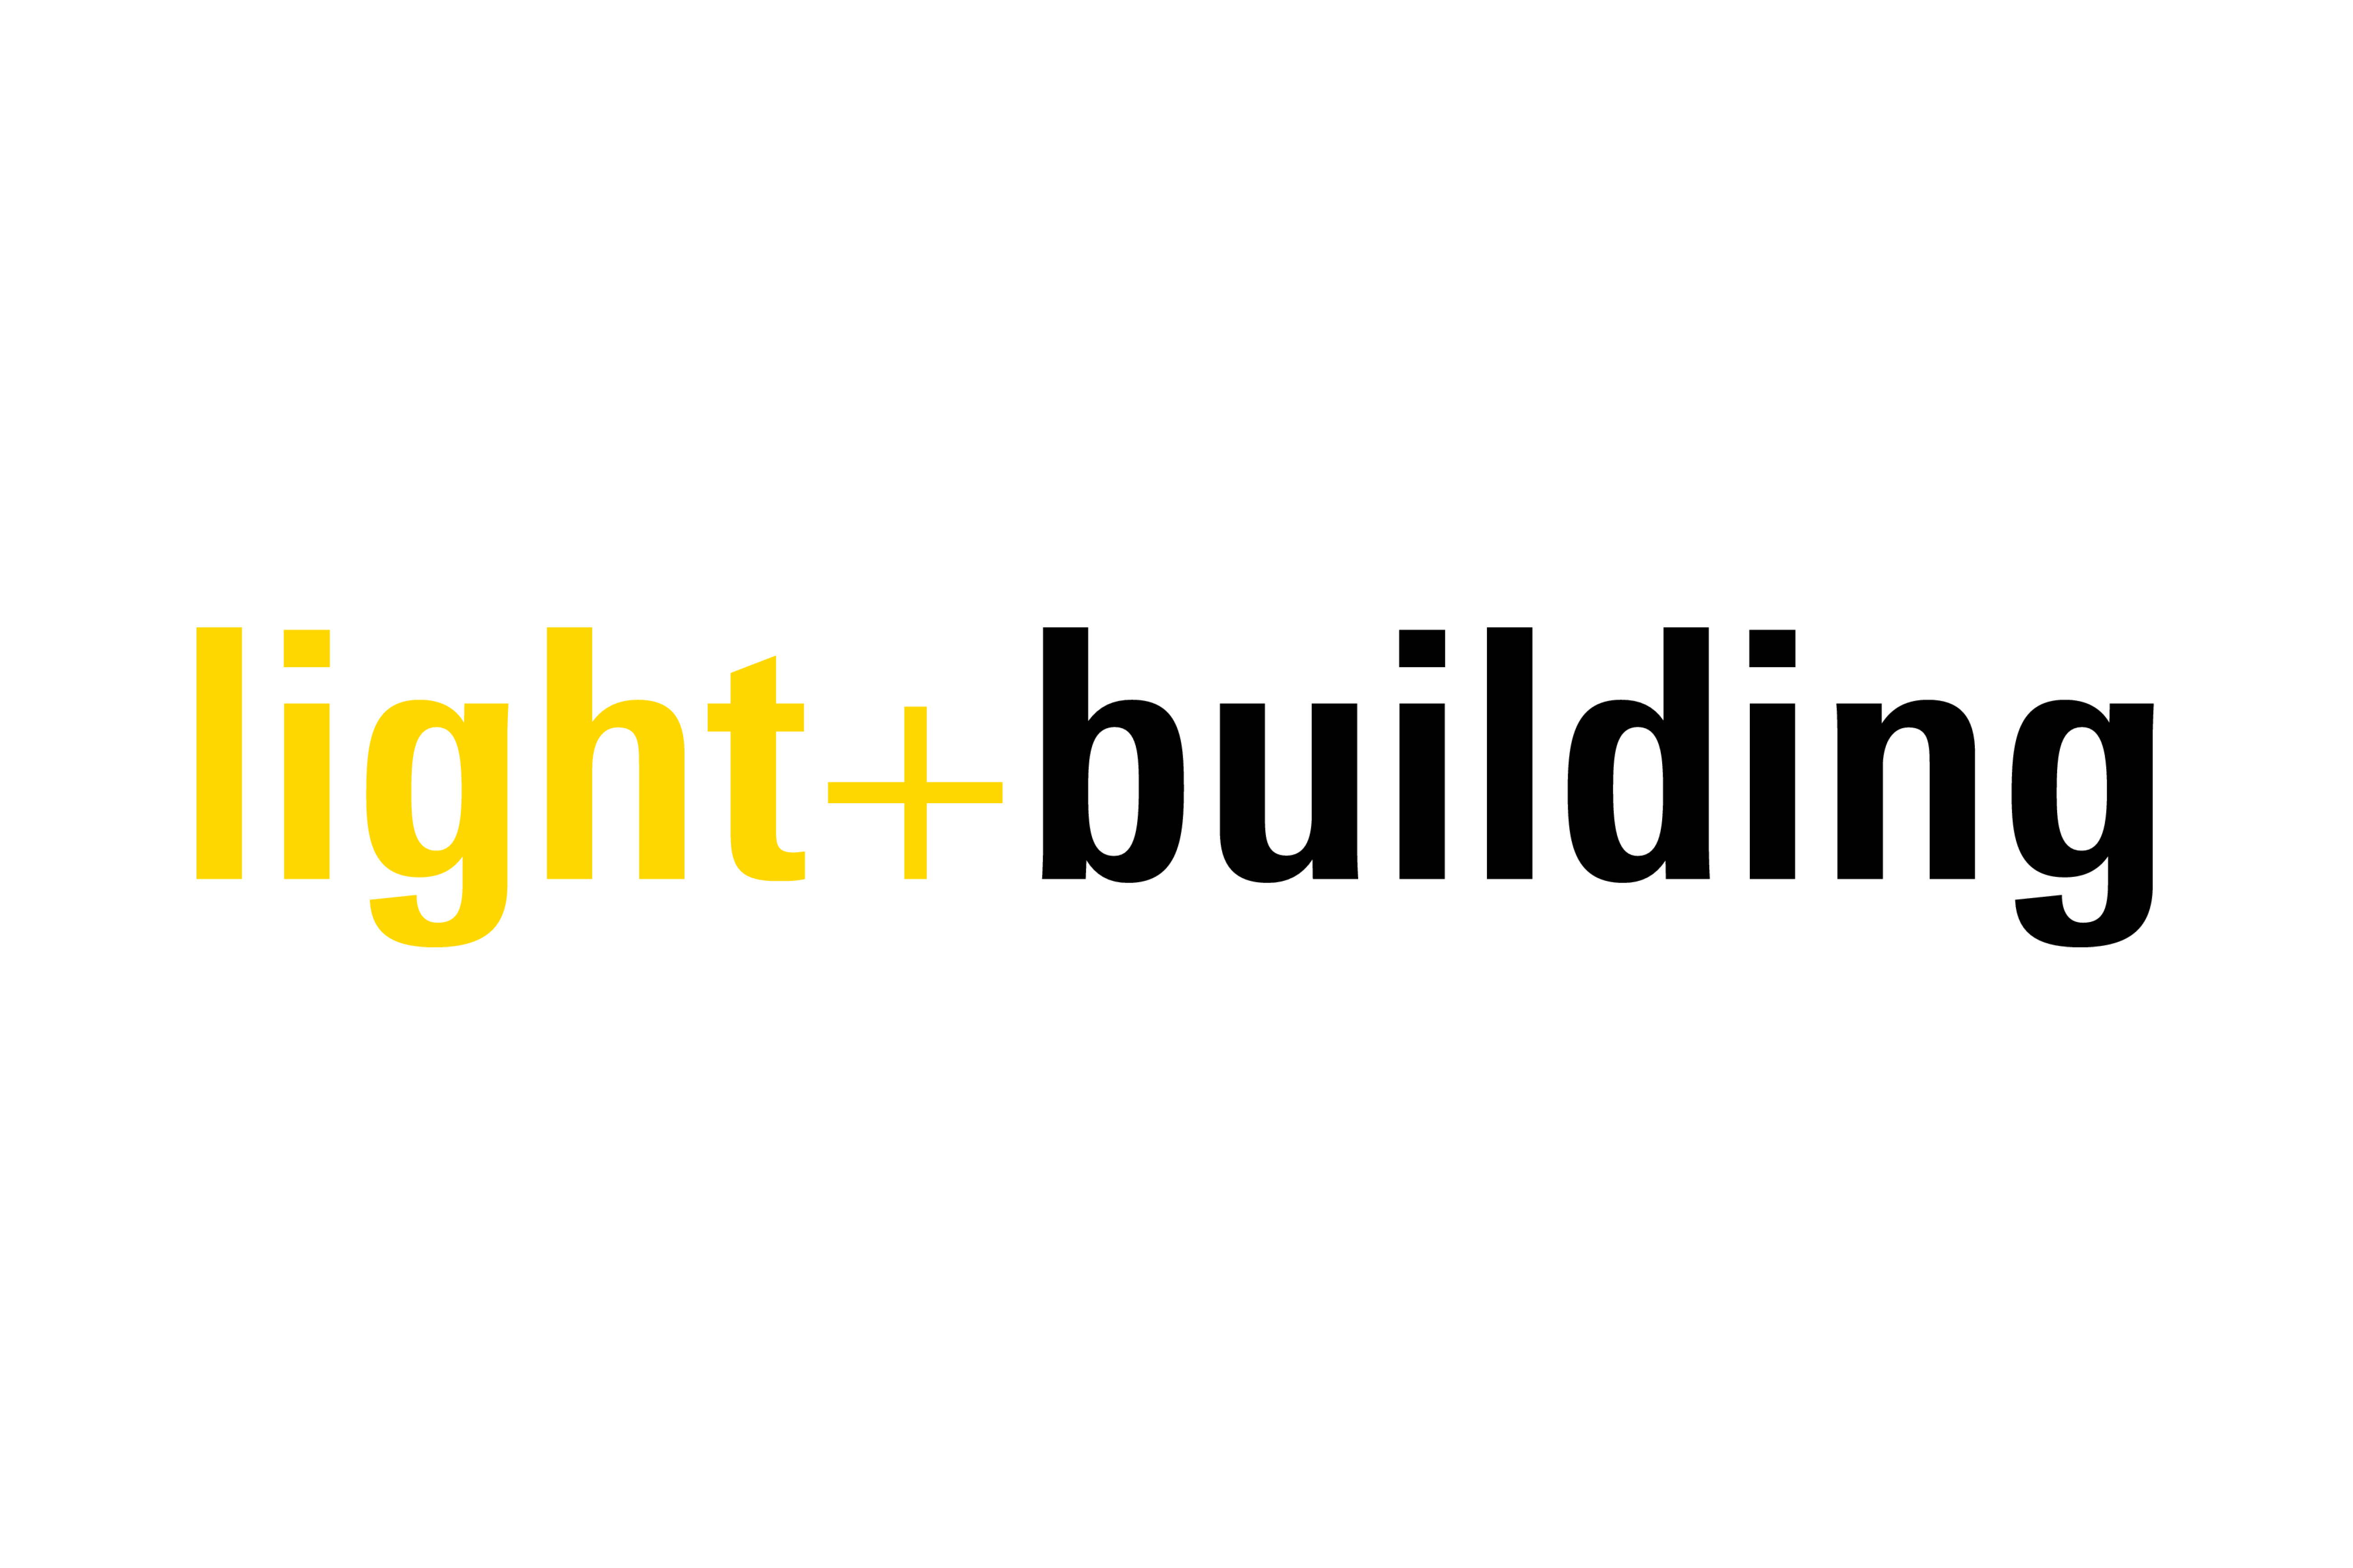 LightBuilding